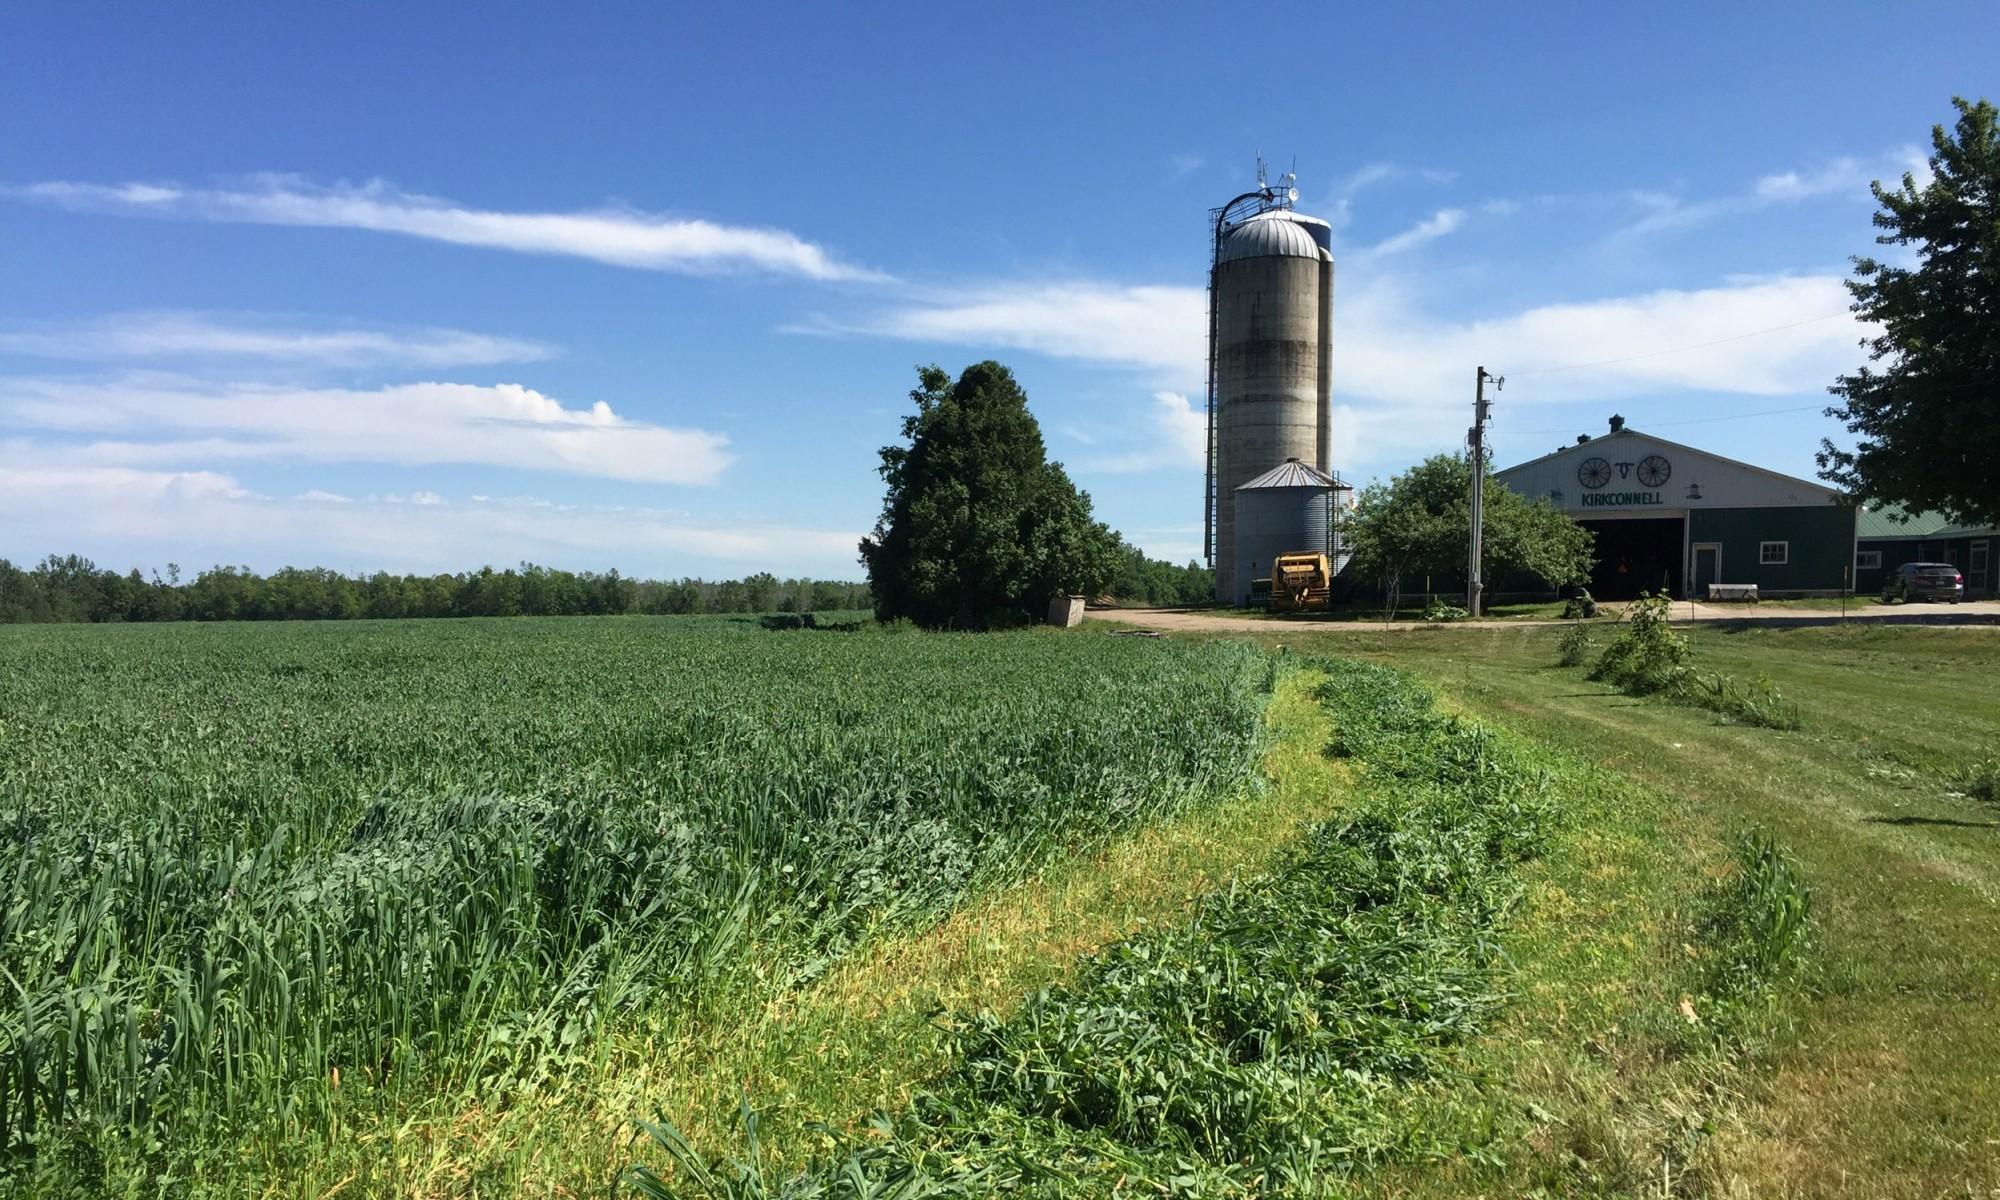 Valleykirk Farms